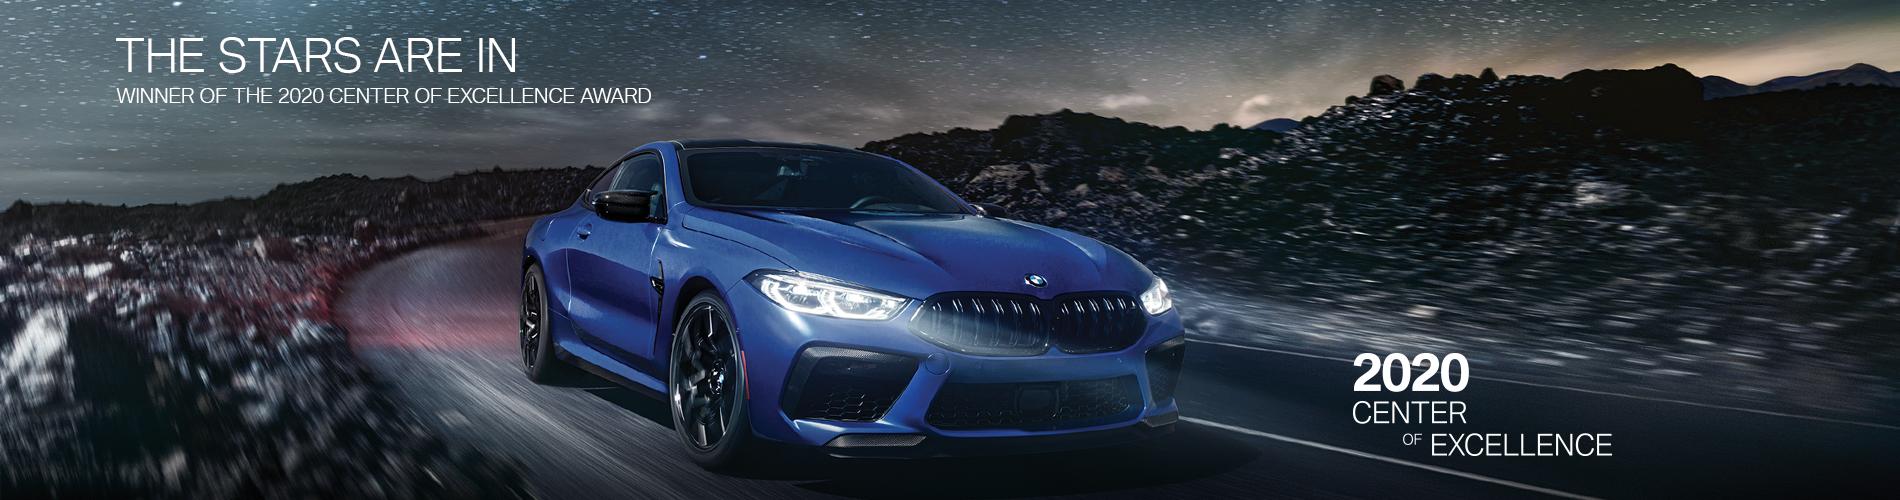 BMW of Minnetonka 2020 BMW Center of Excellence Winner